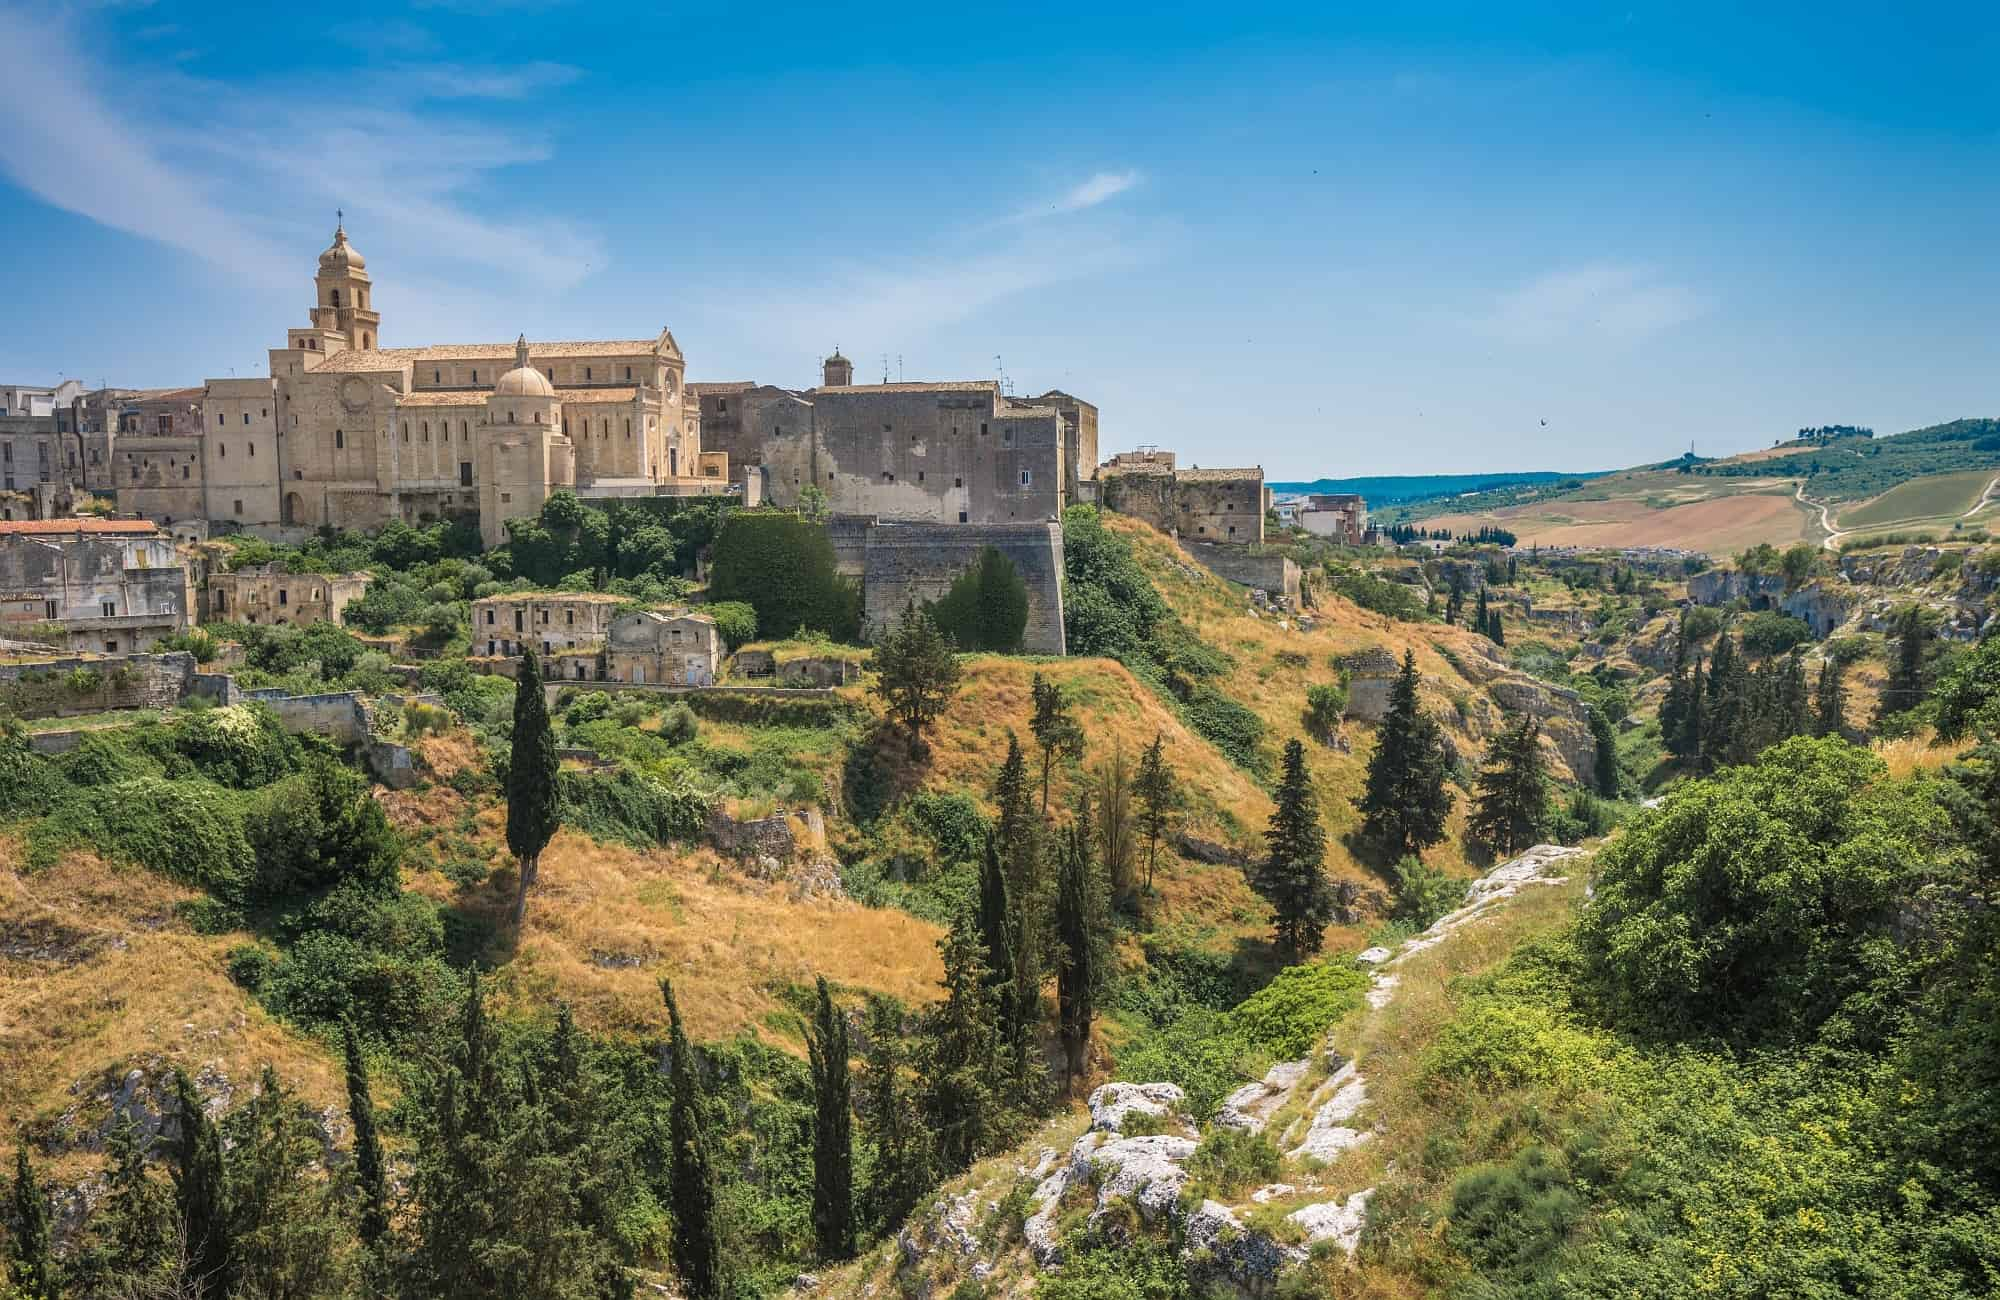 Voyage en Italie - Gravina Di Puglia - Amplitudes